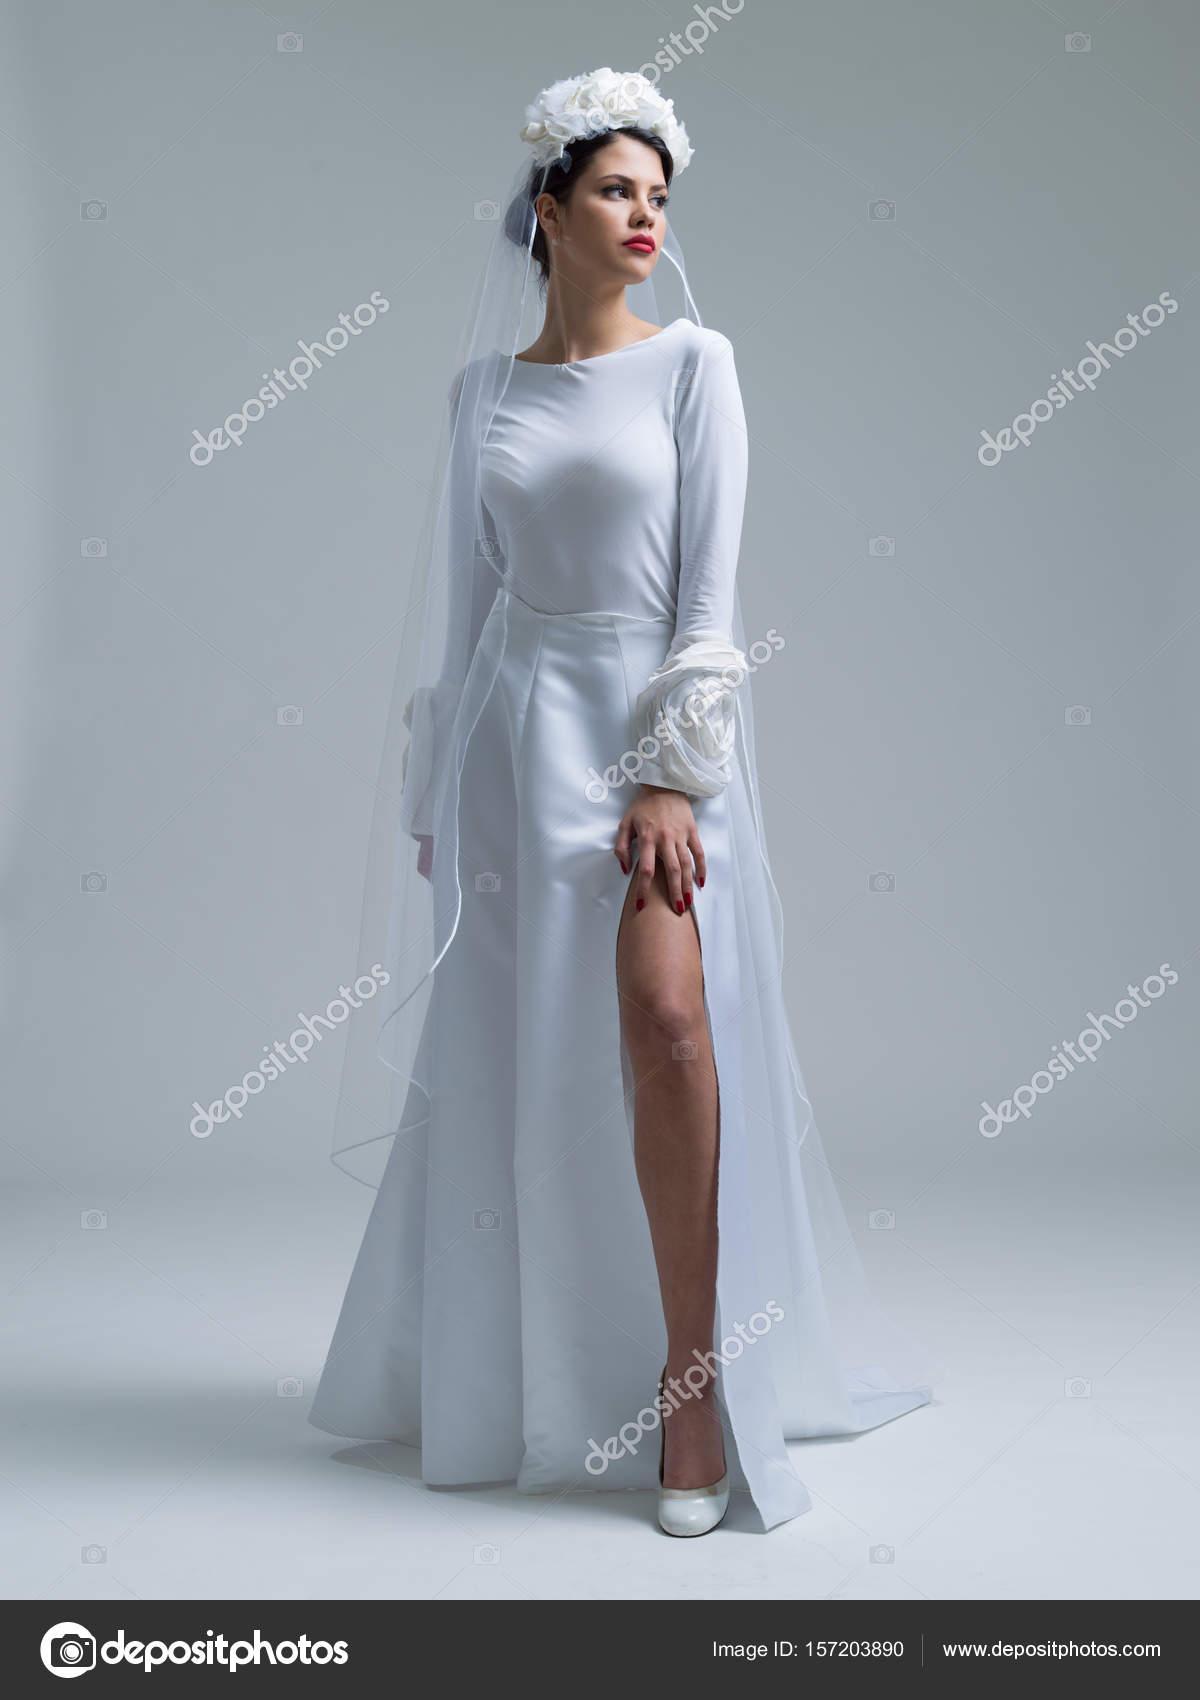 Cute Wedding Dresses For Young Brides Photos - Wedding Ideas ...